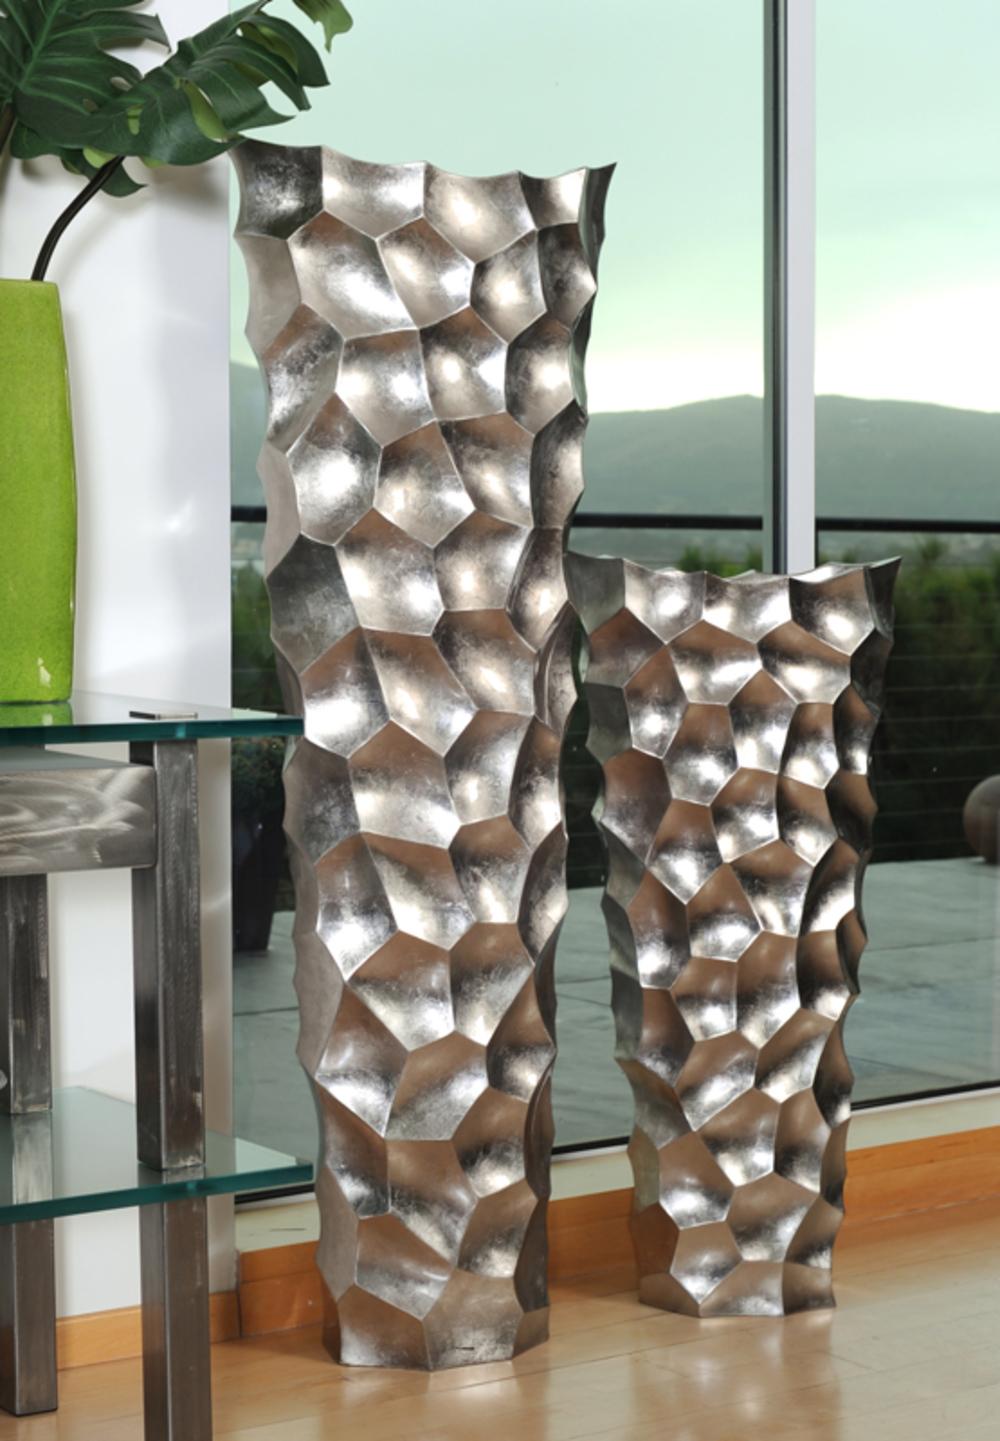 Hebi Arts - Stone Age Floor Vase